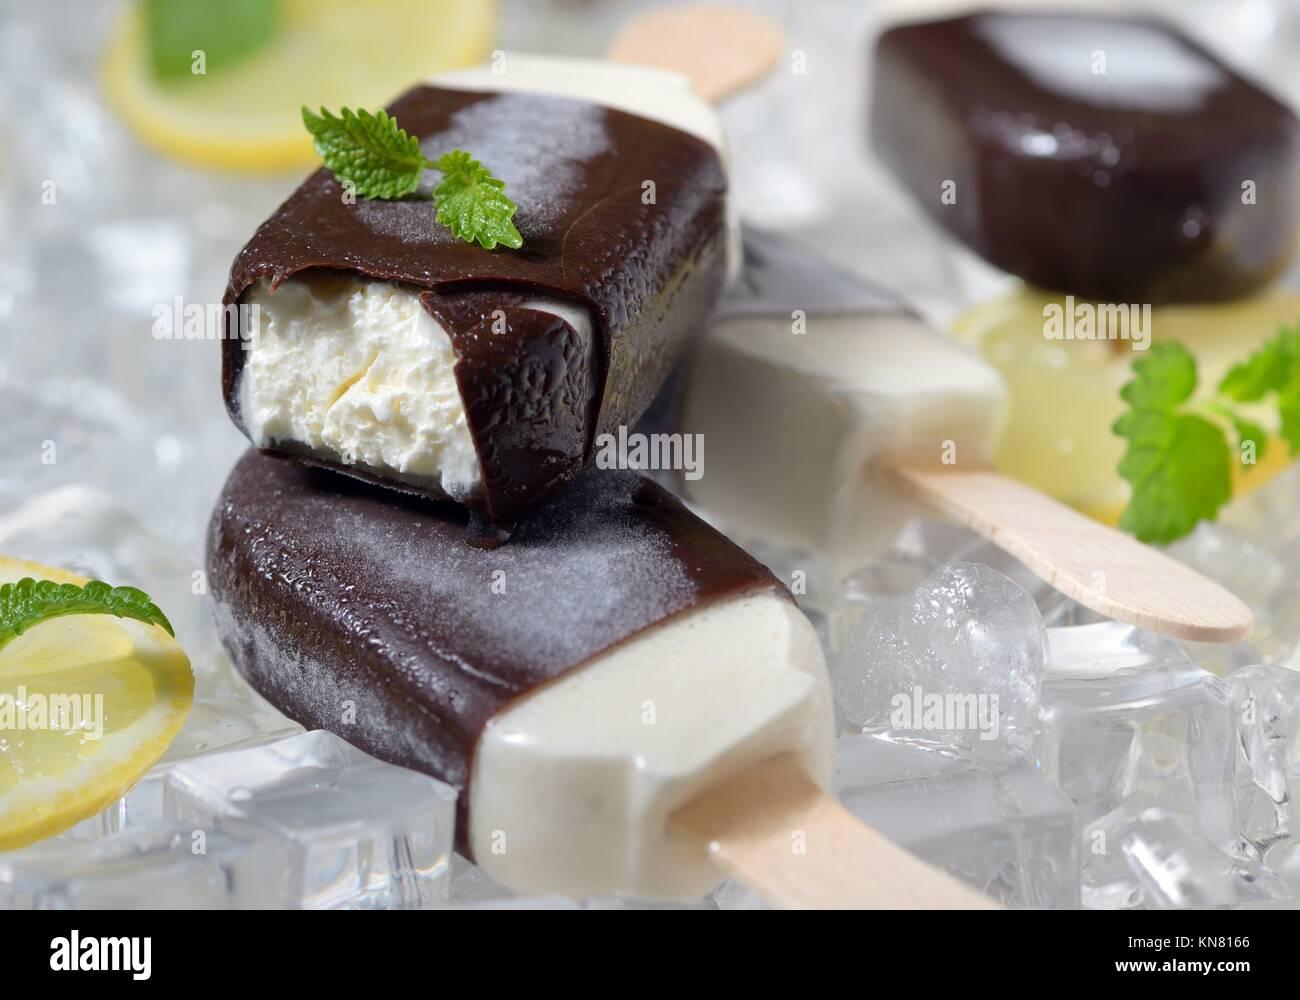 mint ice cream with lemon slices on ice cubes. - Stock Image